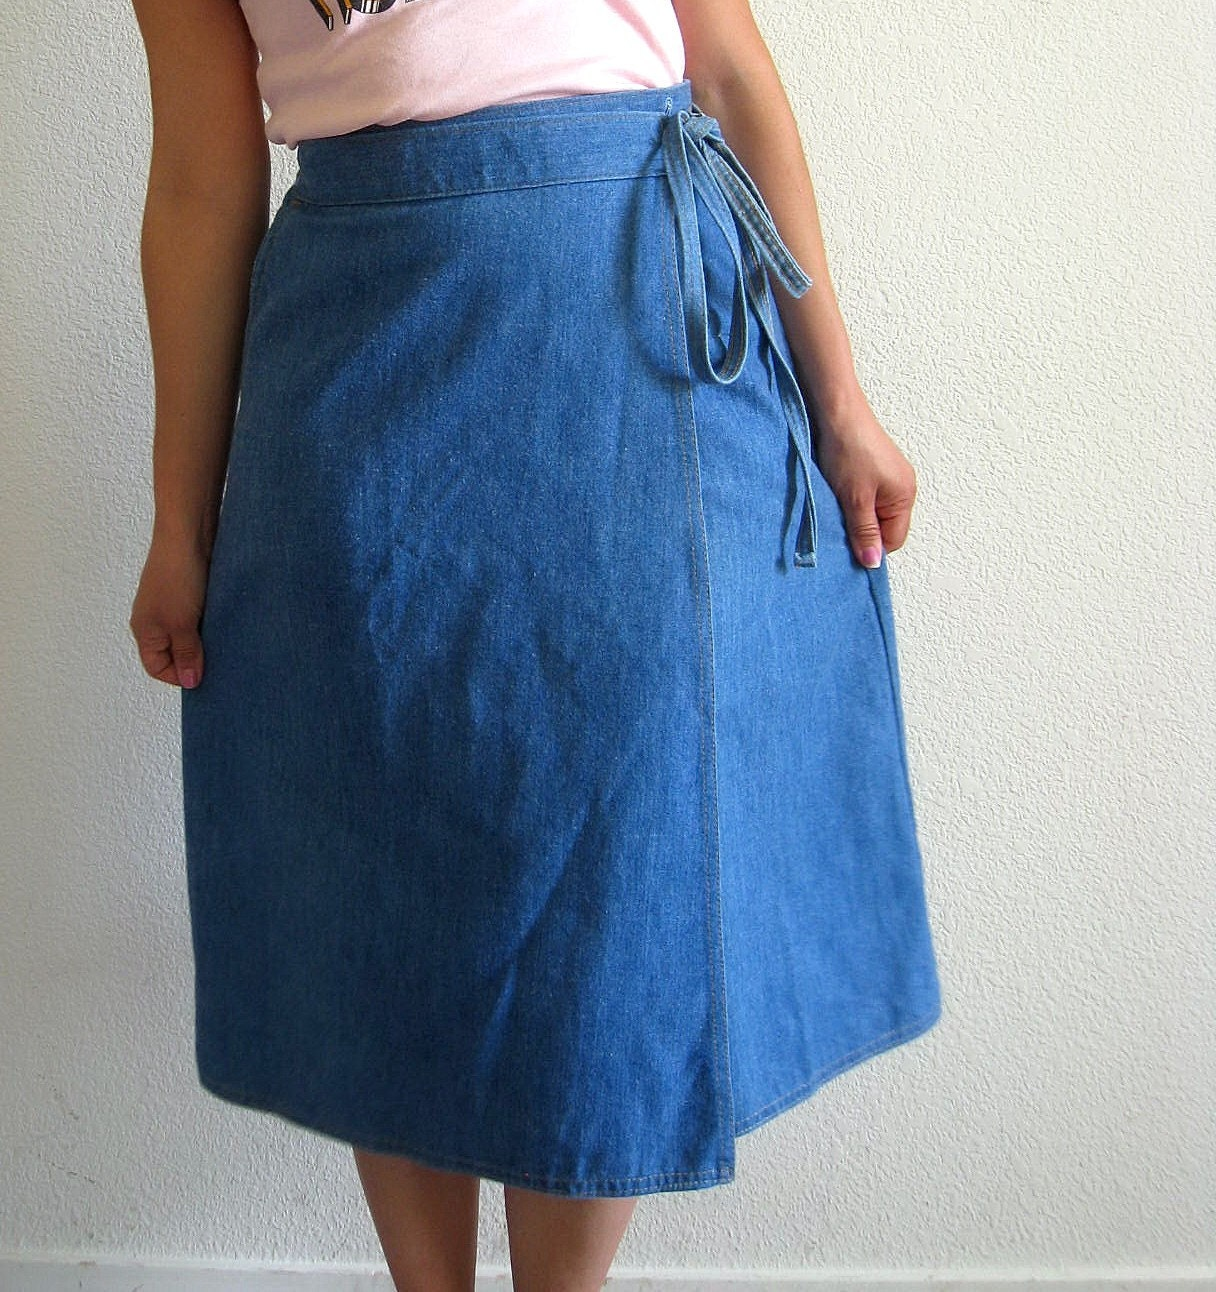 vintage 70s levis soft denim wrap skirt by lolavintage on etsy